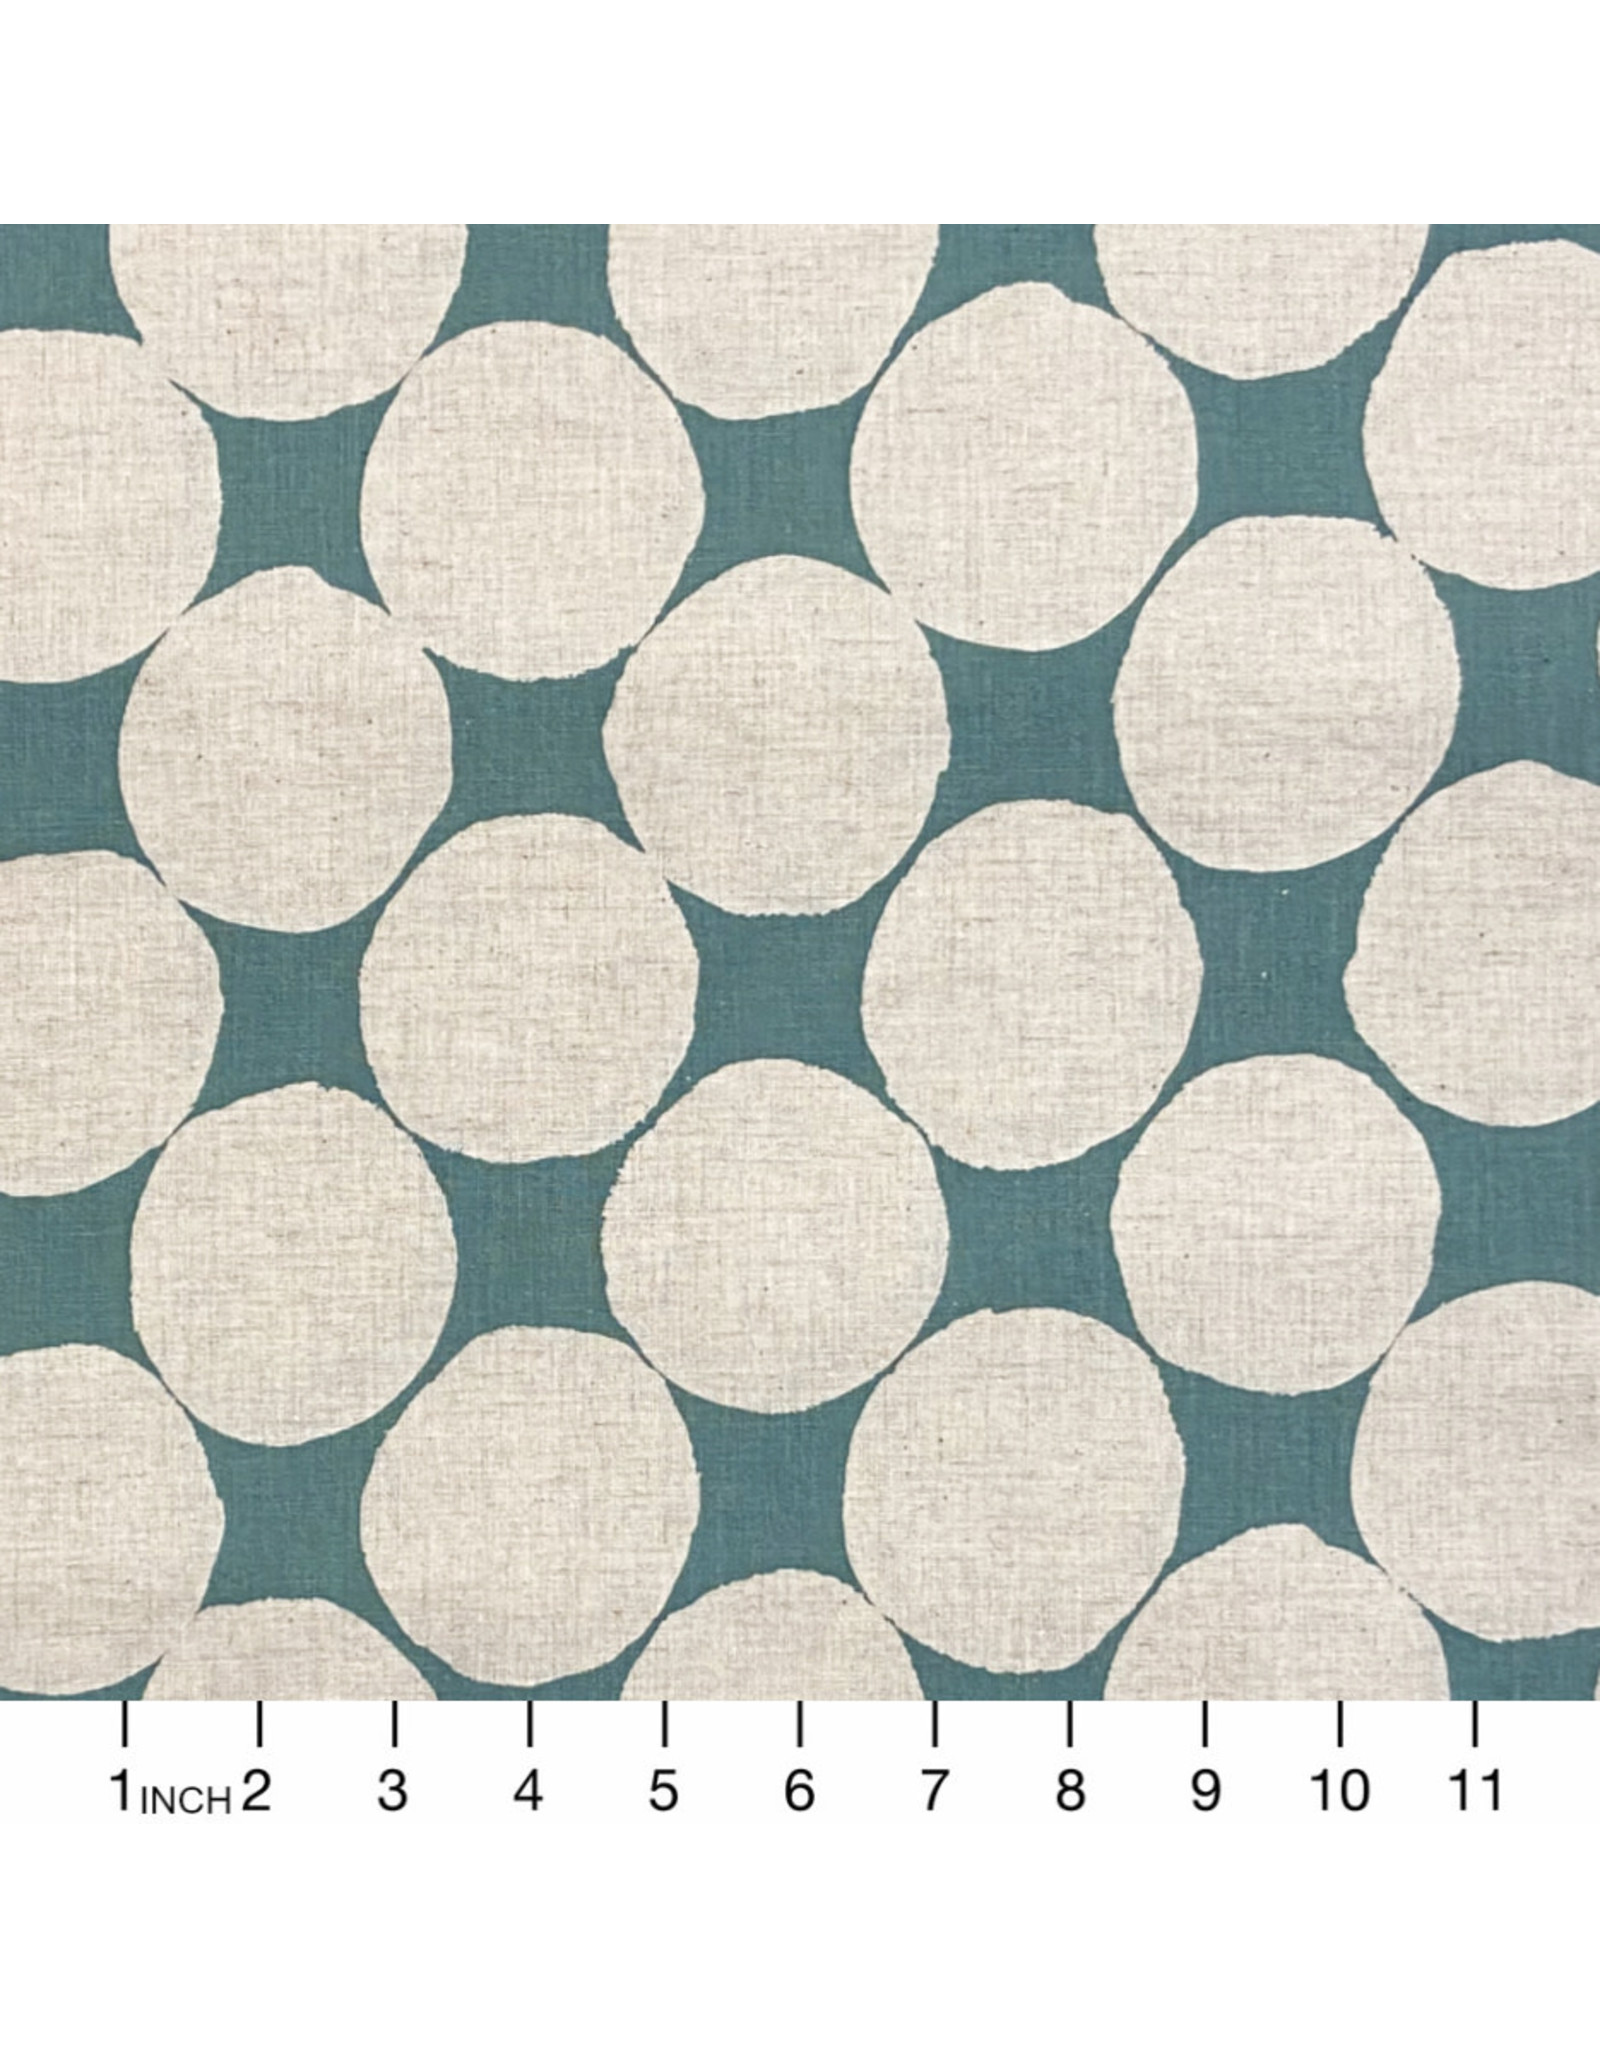 Japan Import Rayon/Linen Blend, Big Dots on Aqua, Fabric Half-Yards, Japan Import